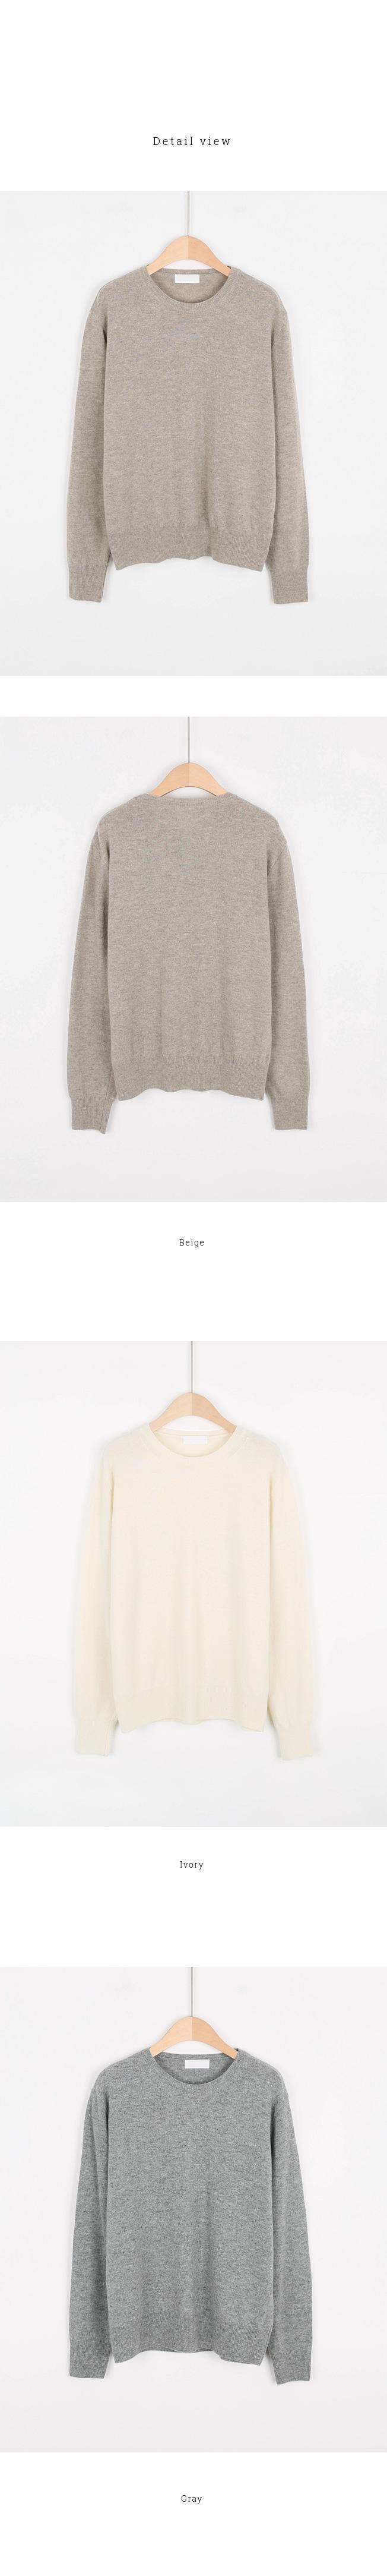 Mono Round Neck Wool Knit